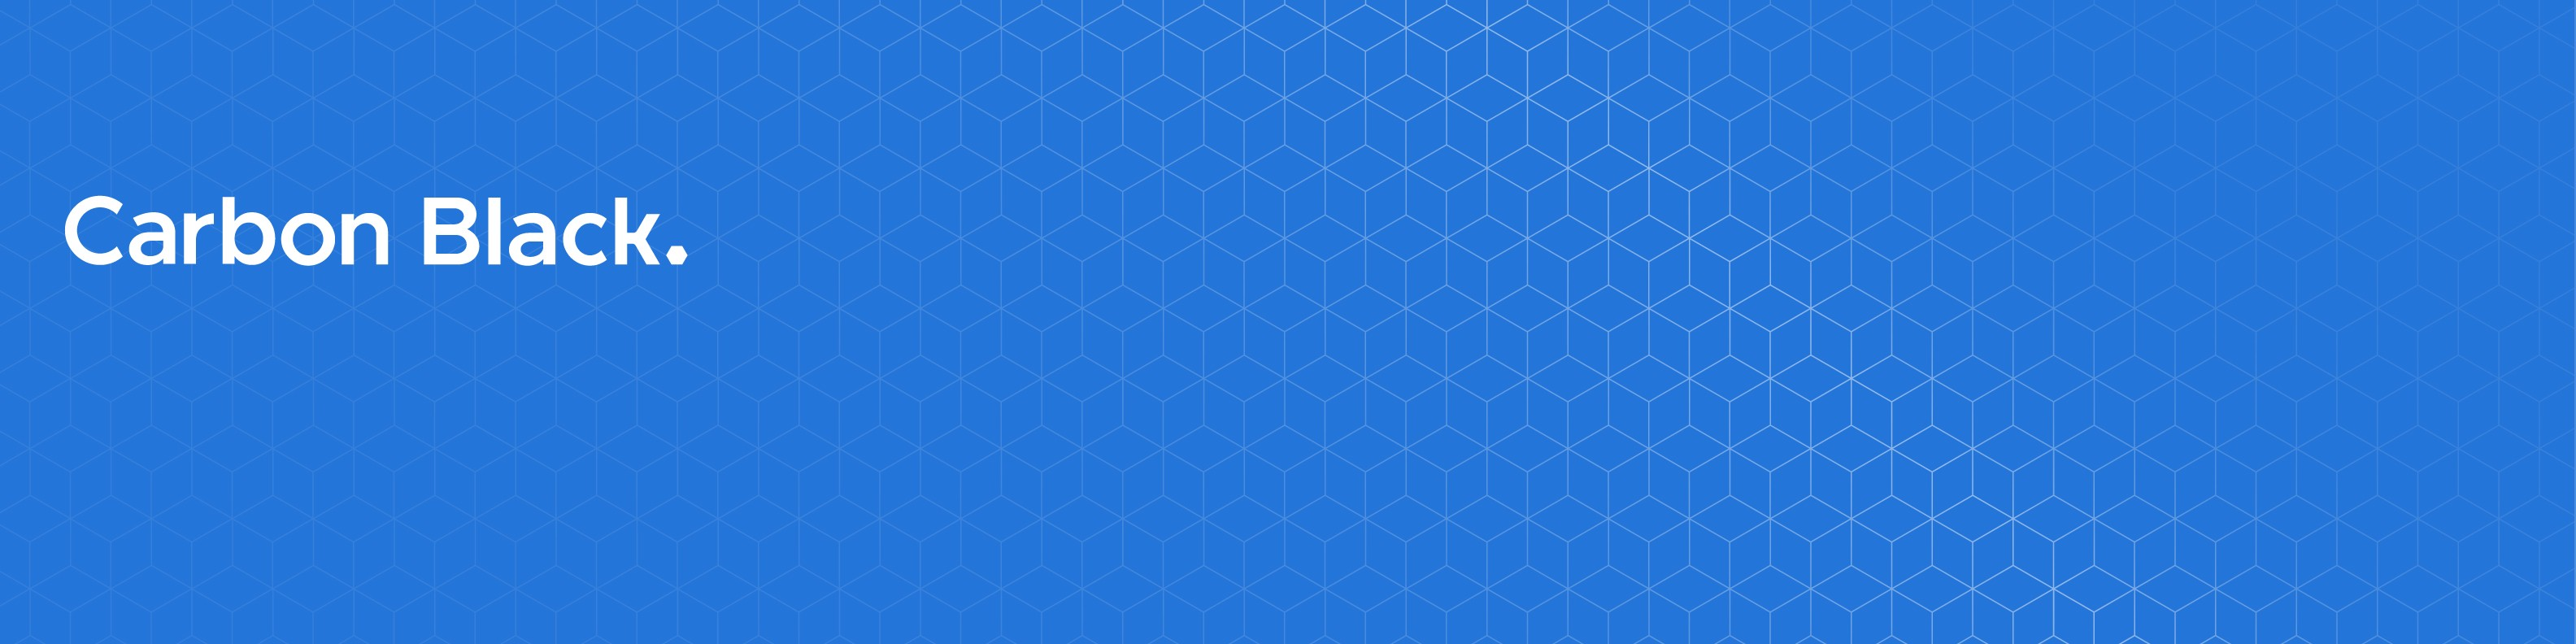 Carbon Black, Inc  | LinkedIn